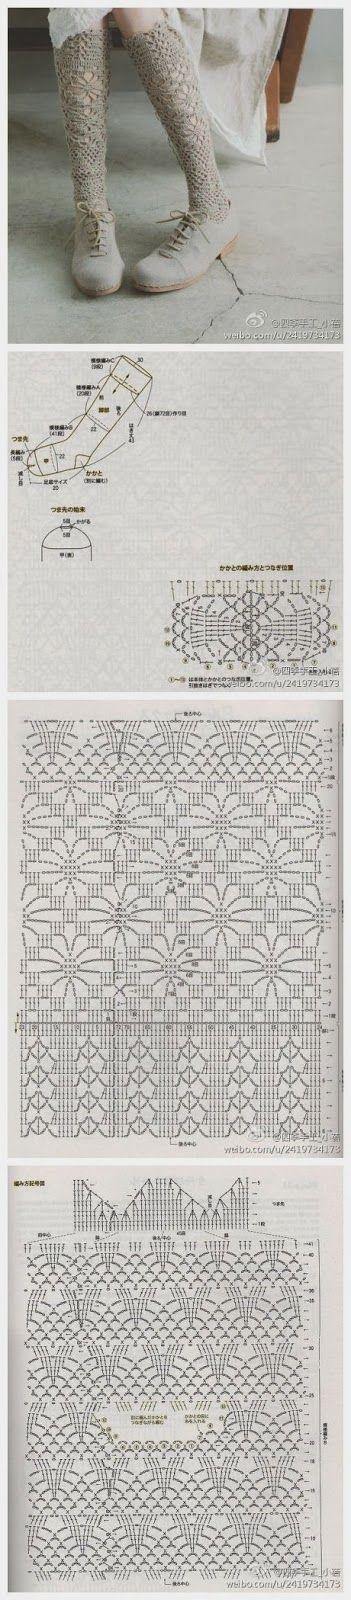 crochet socks / and many other beautiful patterns http://miimii-diy.blogspot.com/2013/12/magia-szydeka-inspiracje-i-wzory-dla.html